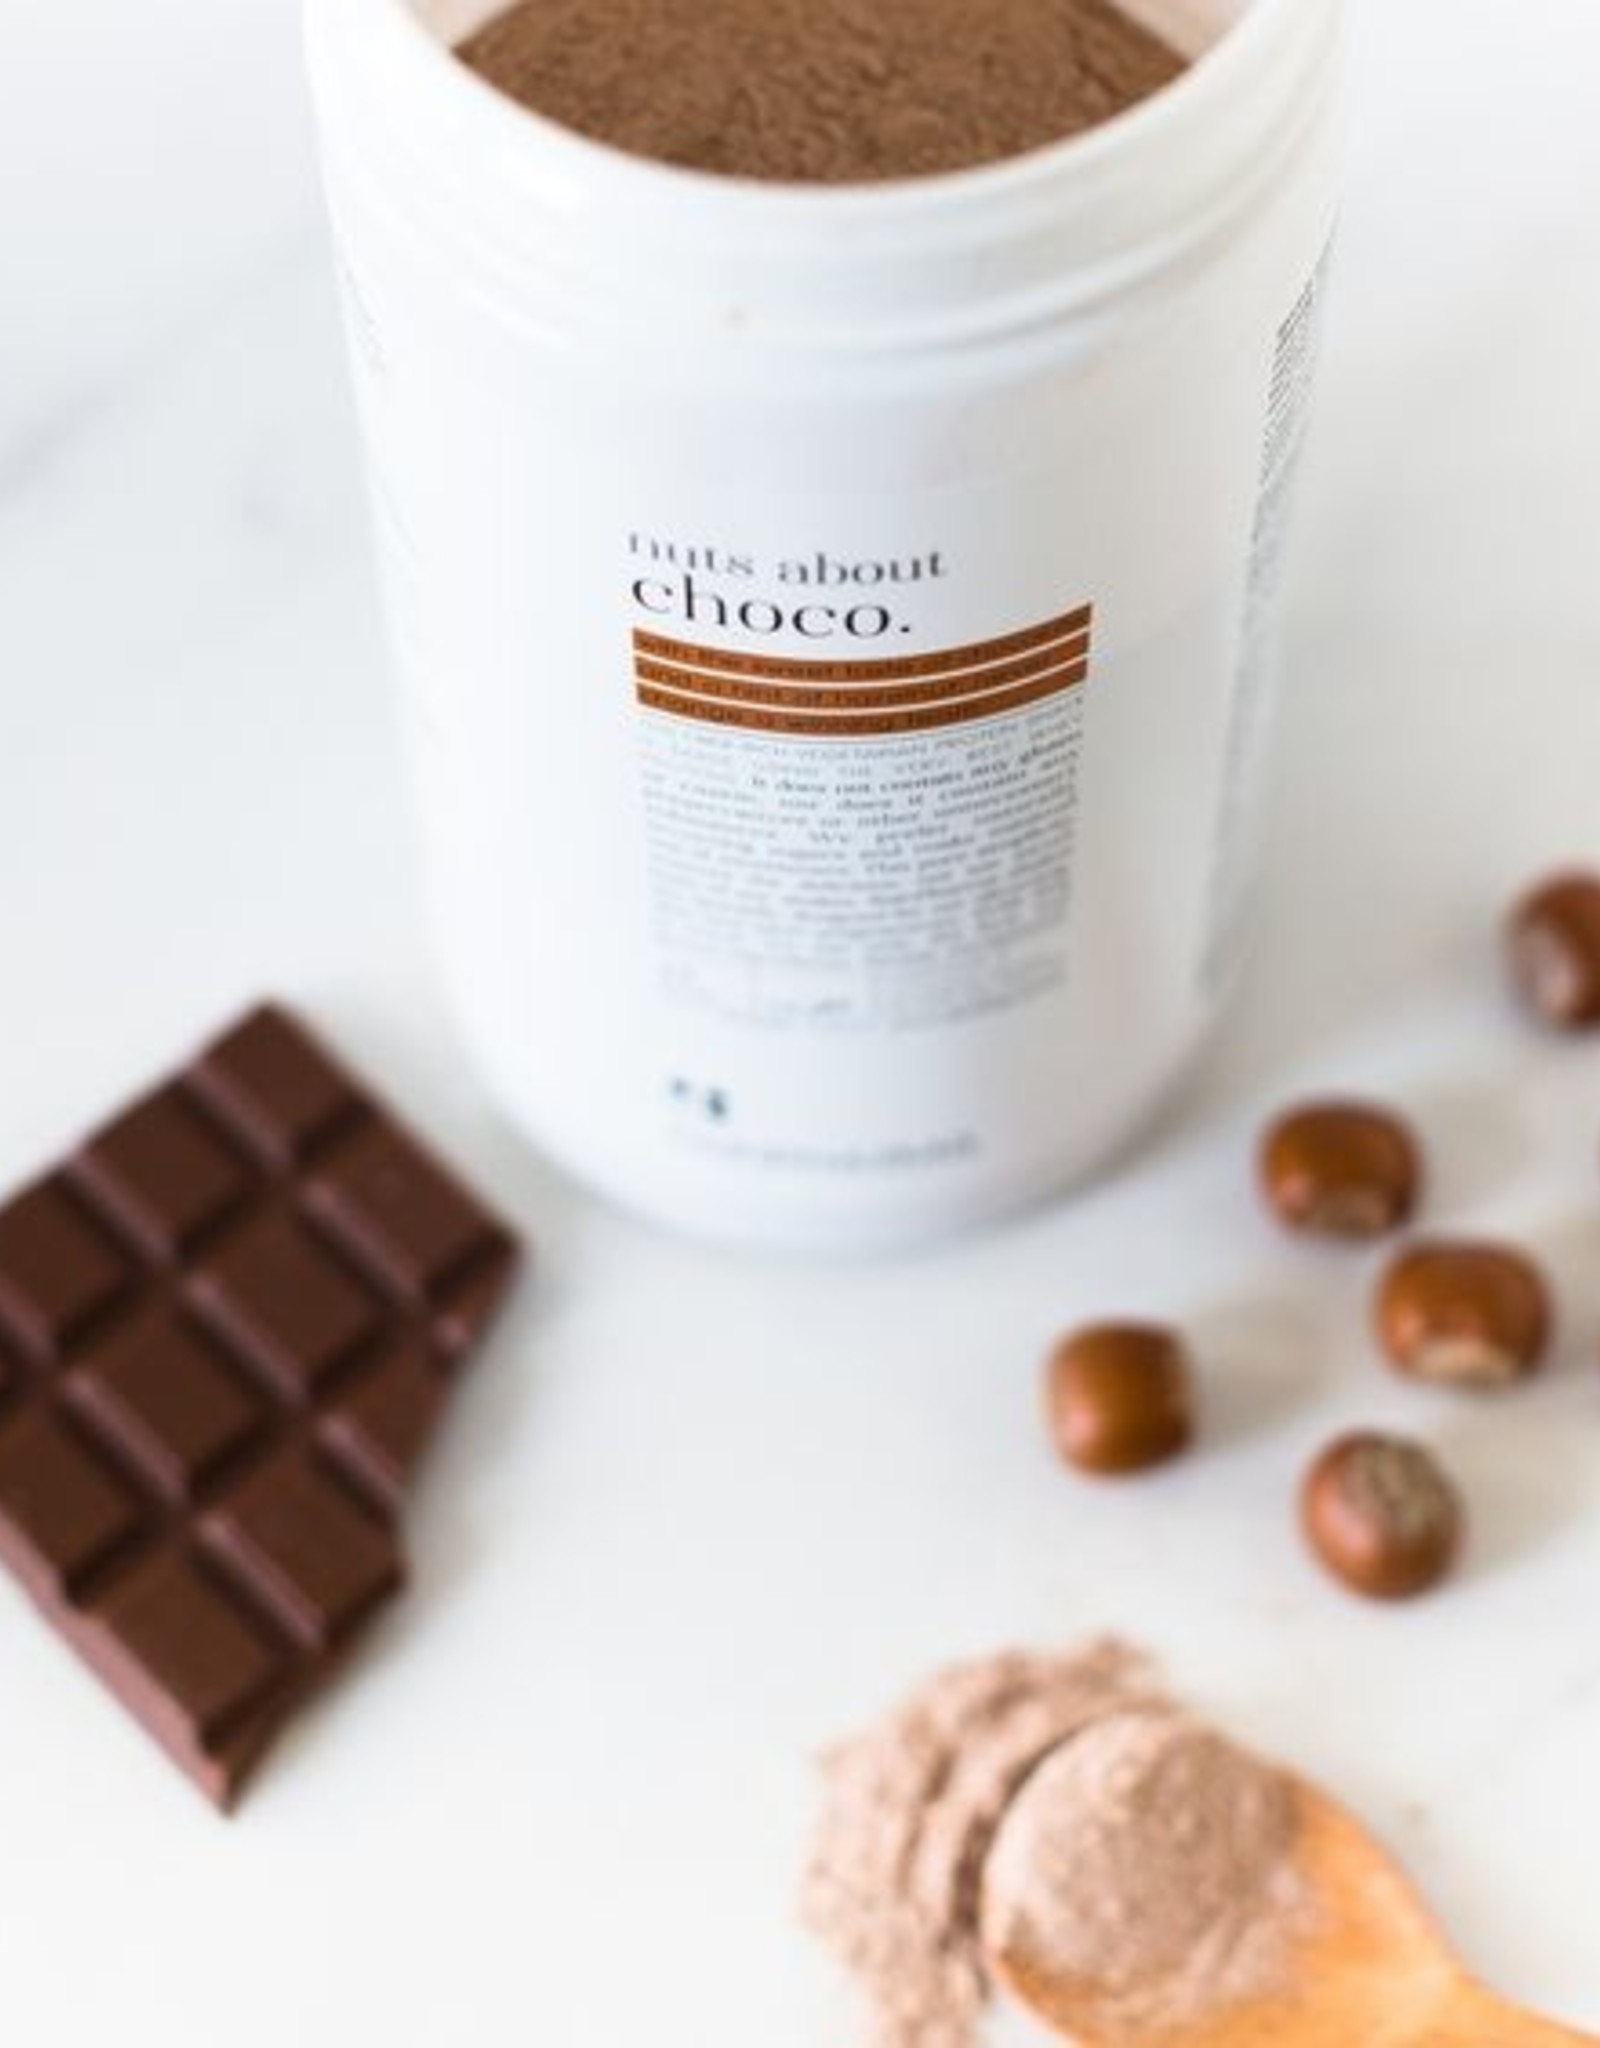 RainPharma Rainpharma - SNP BOX Nuts about Choco